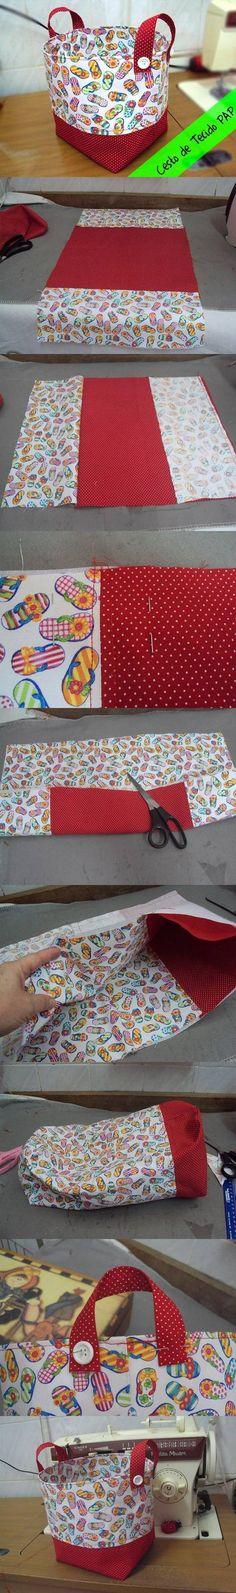 DIY Easy Fabric Basket DIY Easy Fabric Basket by diyforever DIY Easy Stoffkorb DIY Easy Stoffkorb von diyforever This image. Sewing Hacks, Sewing Tutorials, Sewing Patterns, Free Tutorials, Craft Tutorials, Fabric Crafts, Sewing Crafts, Diy Crafts, Sewing Diy